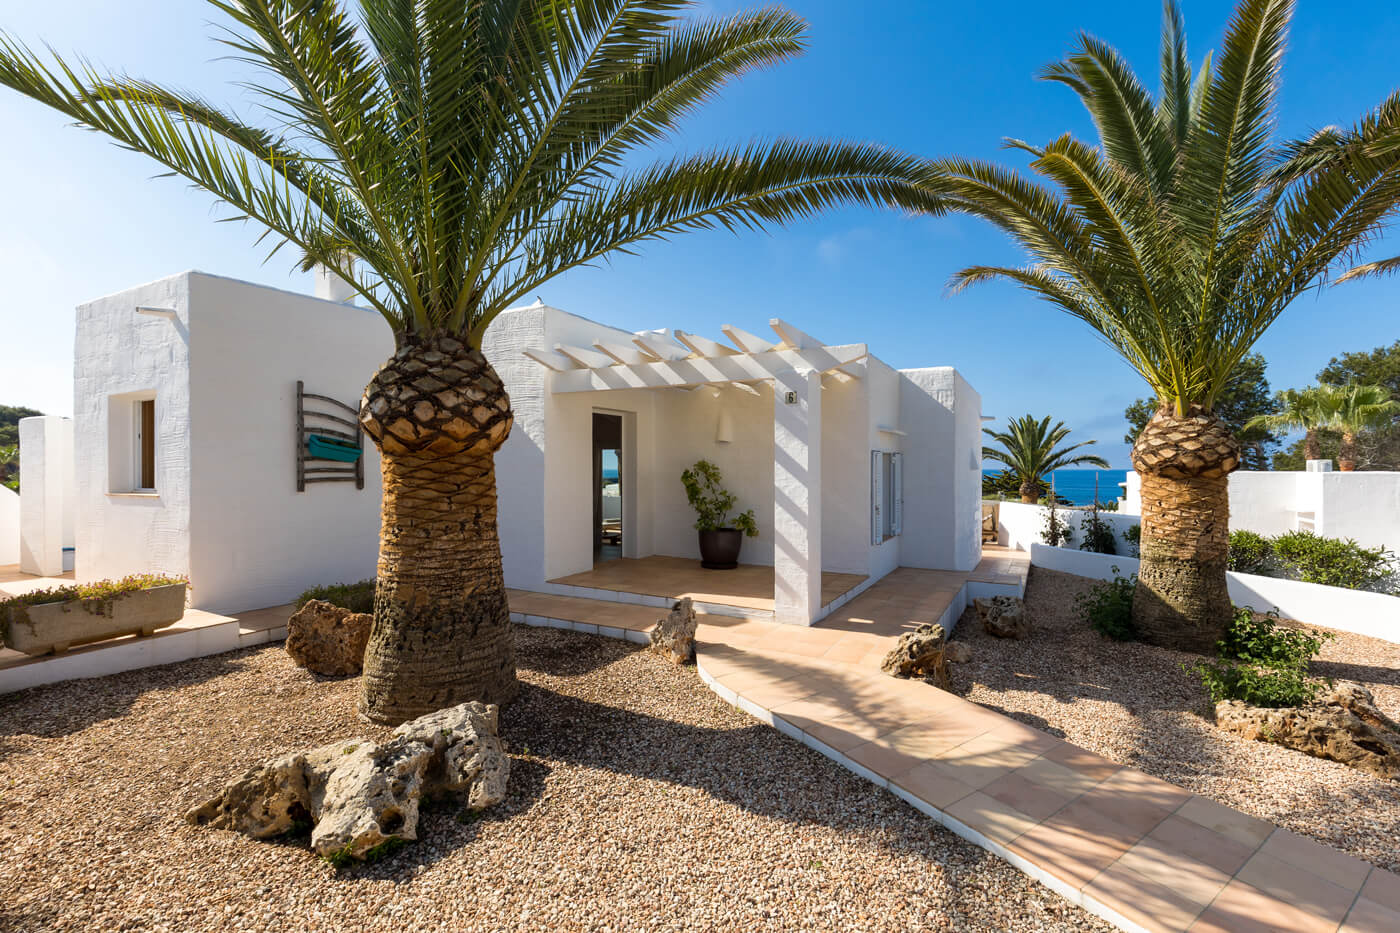 Villas Etnia Menorca - exterior